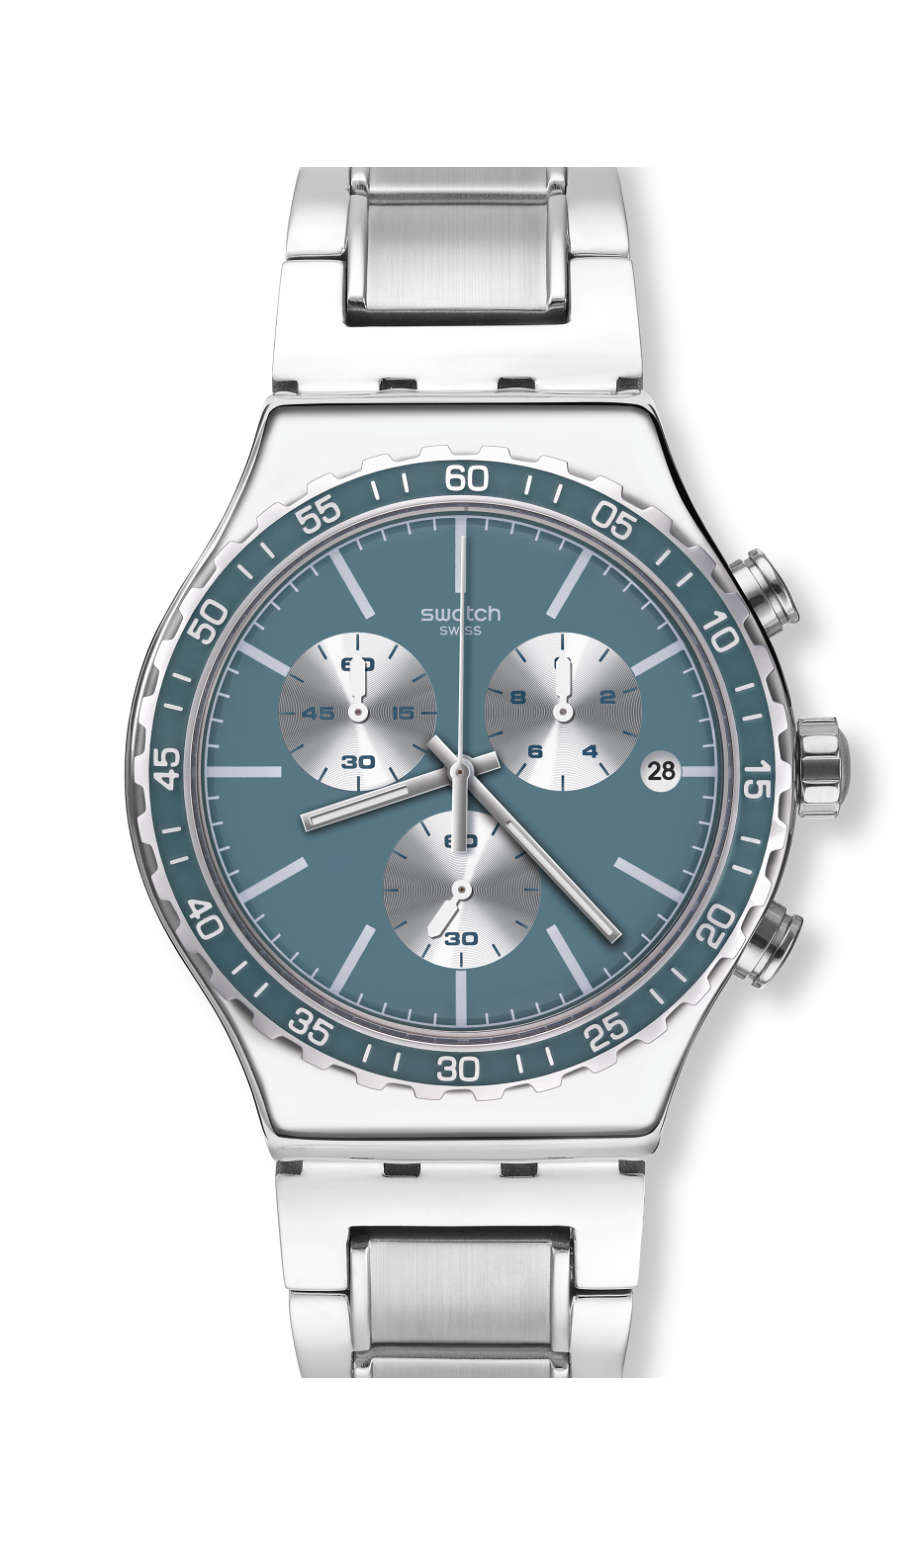 Swatch - IRONFREEZE - 1